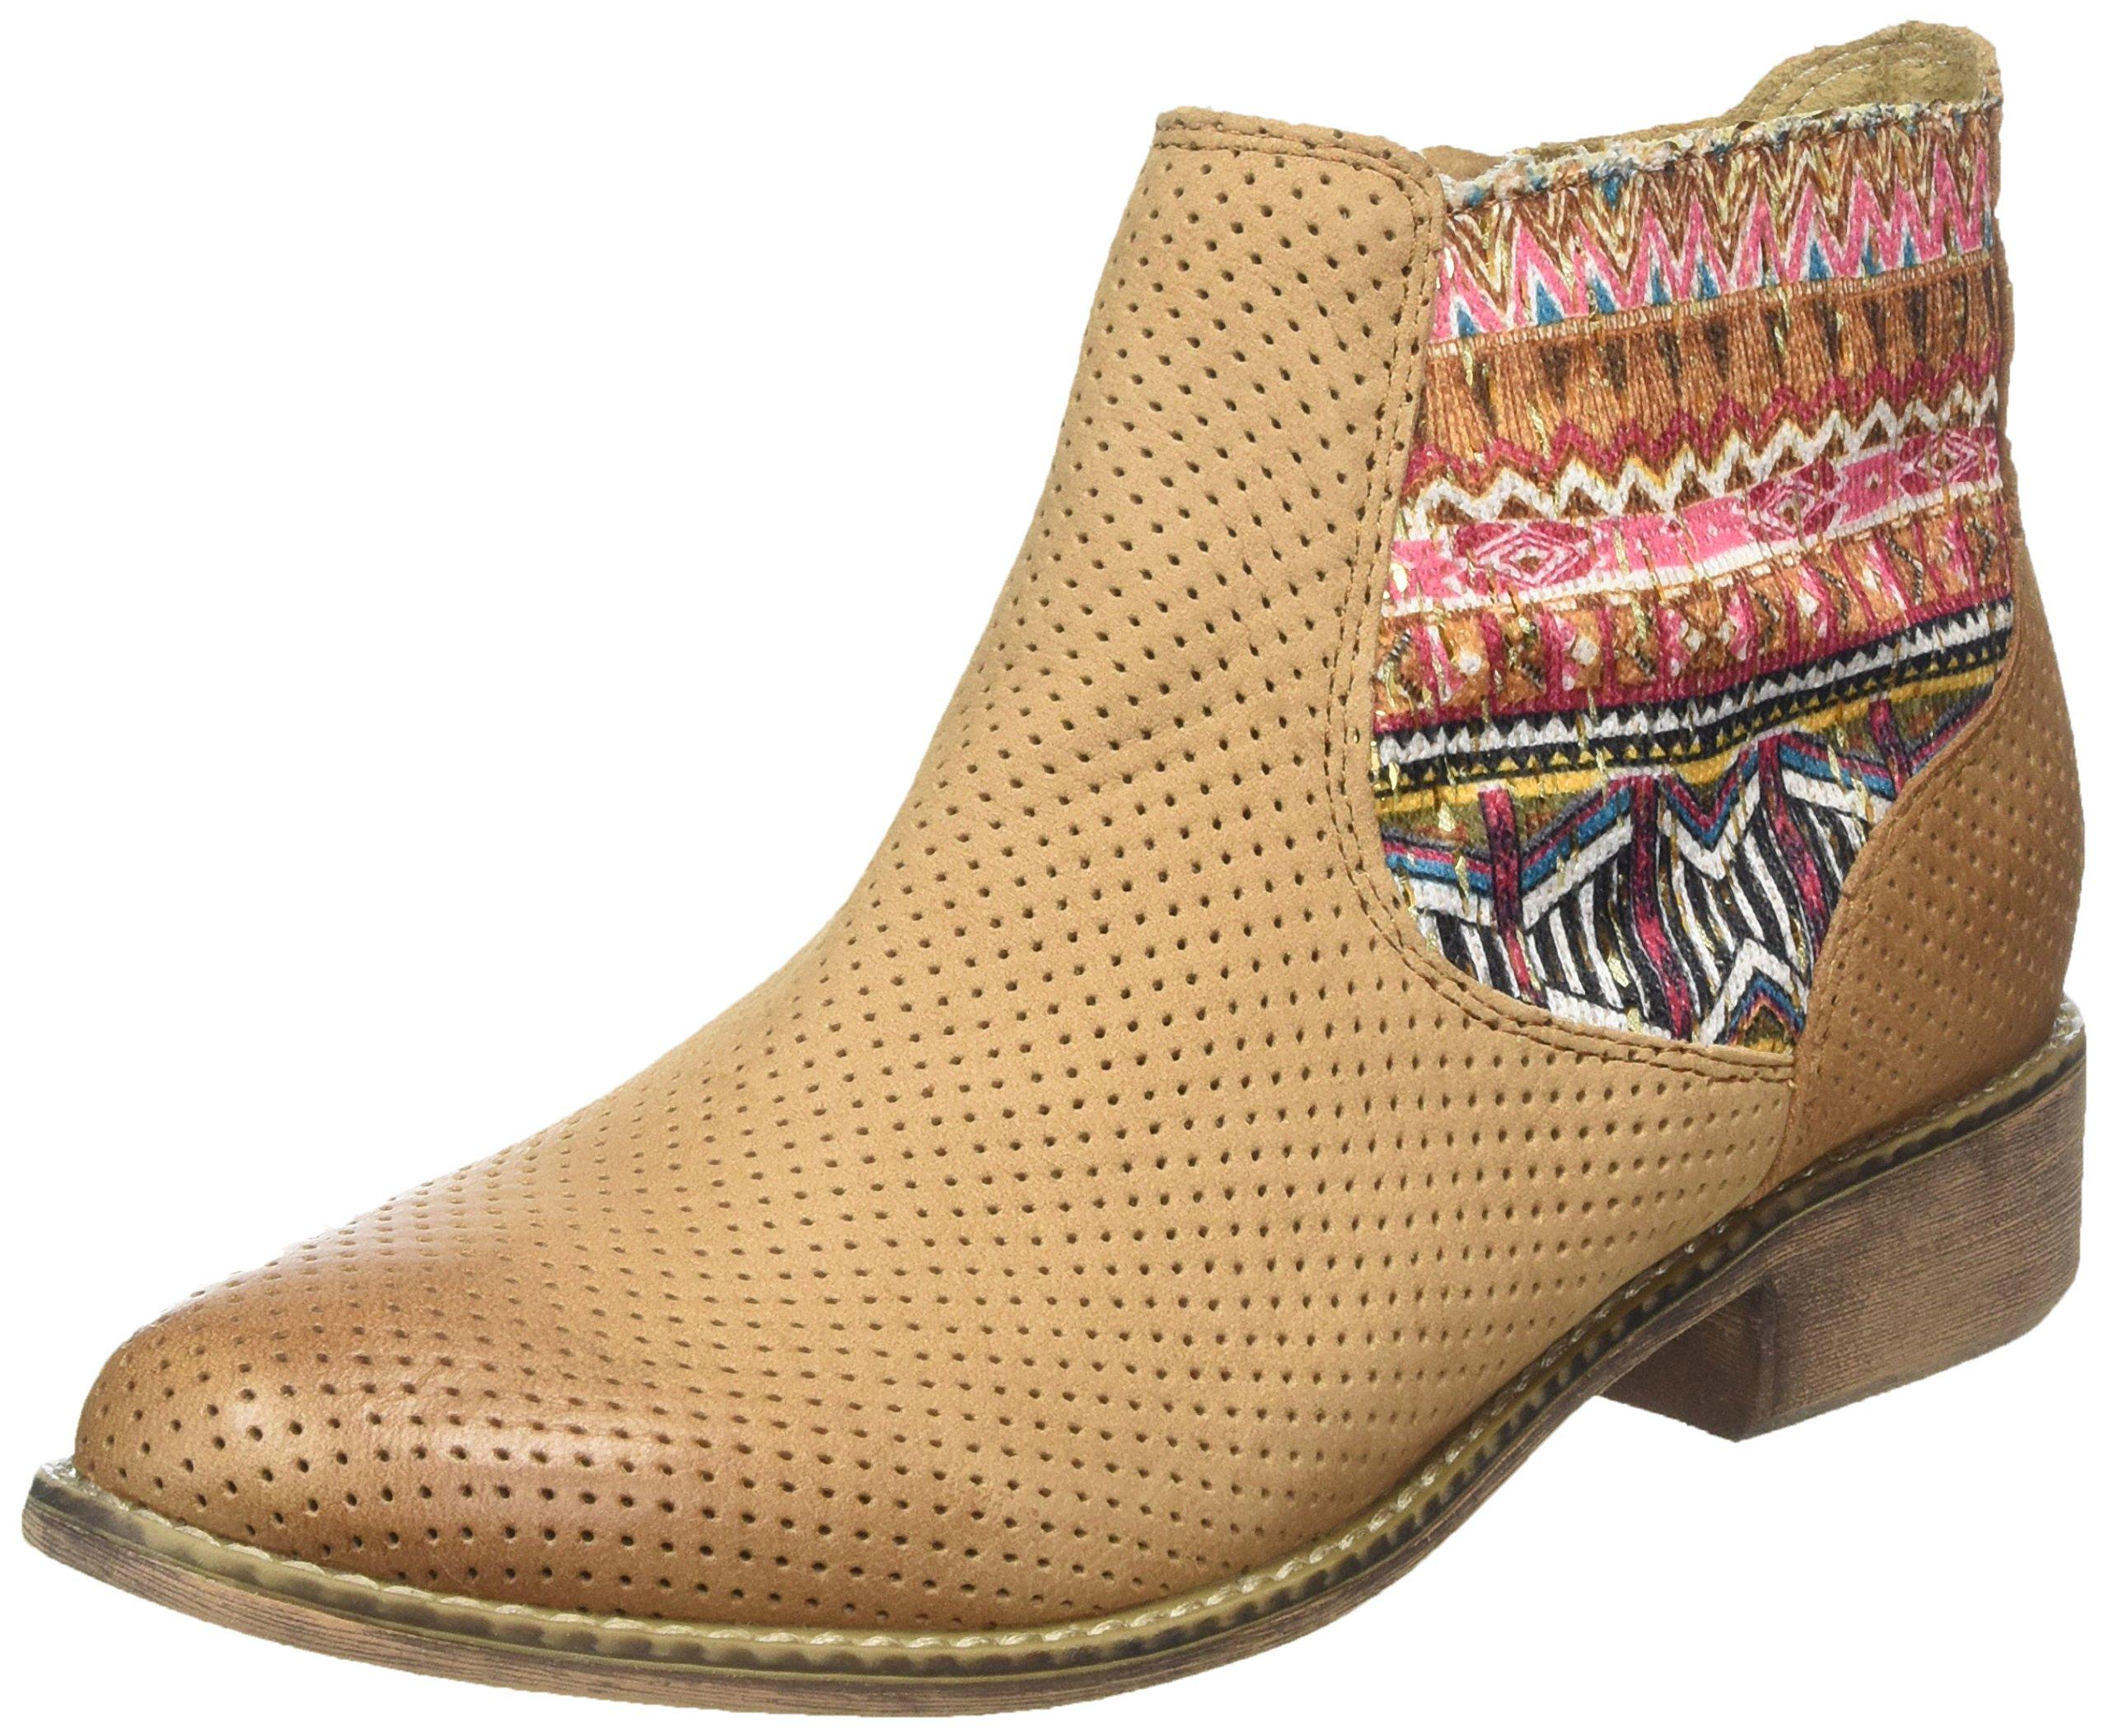 Laufsteg München Womens Summer Boots Brown Size 40 M EU